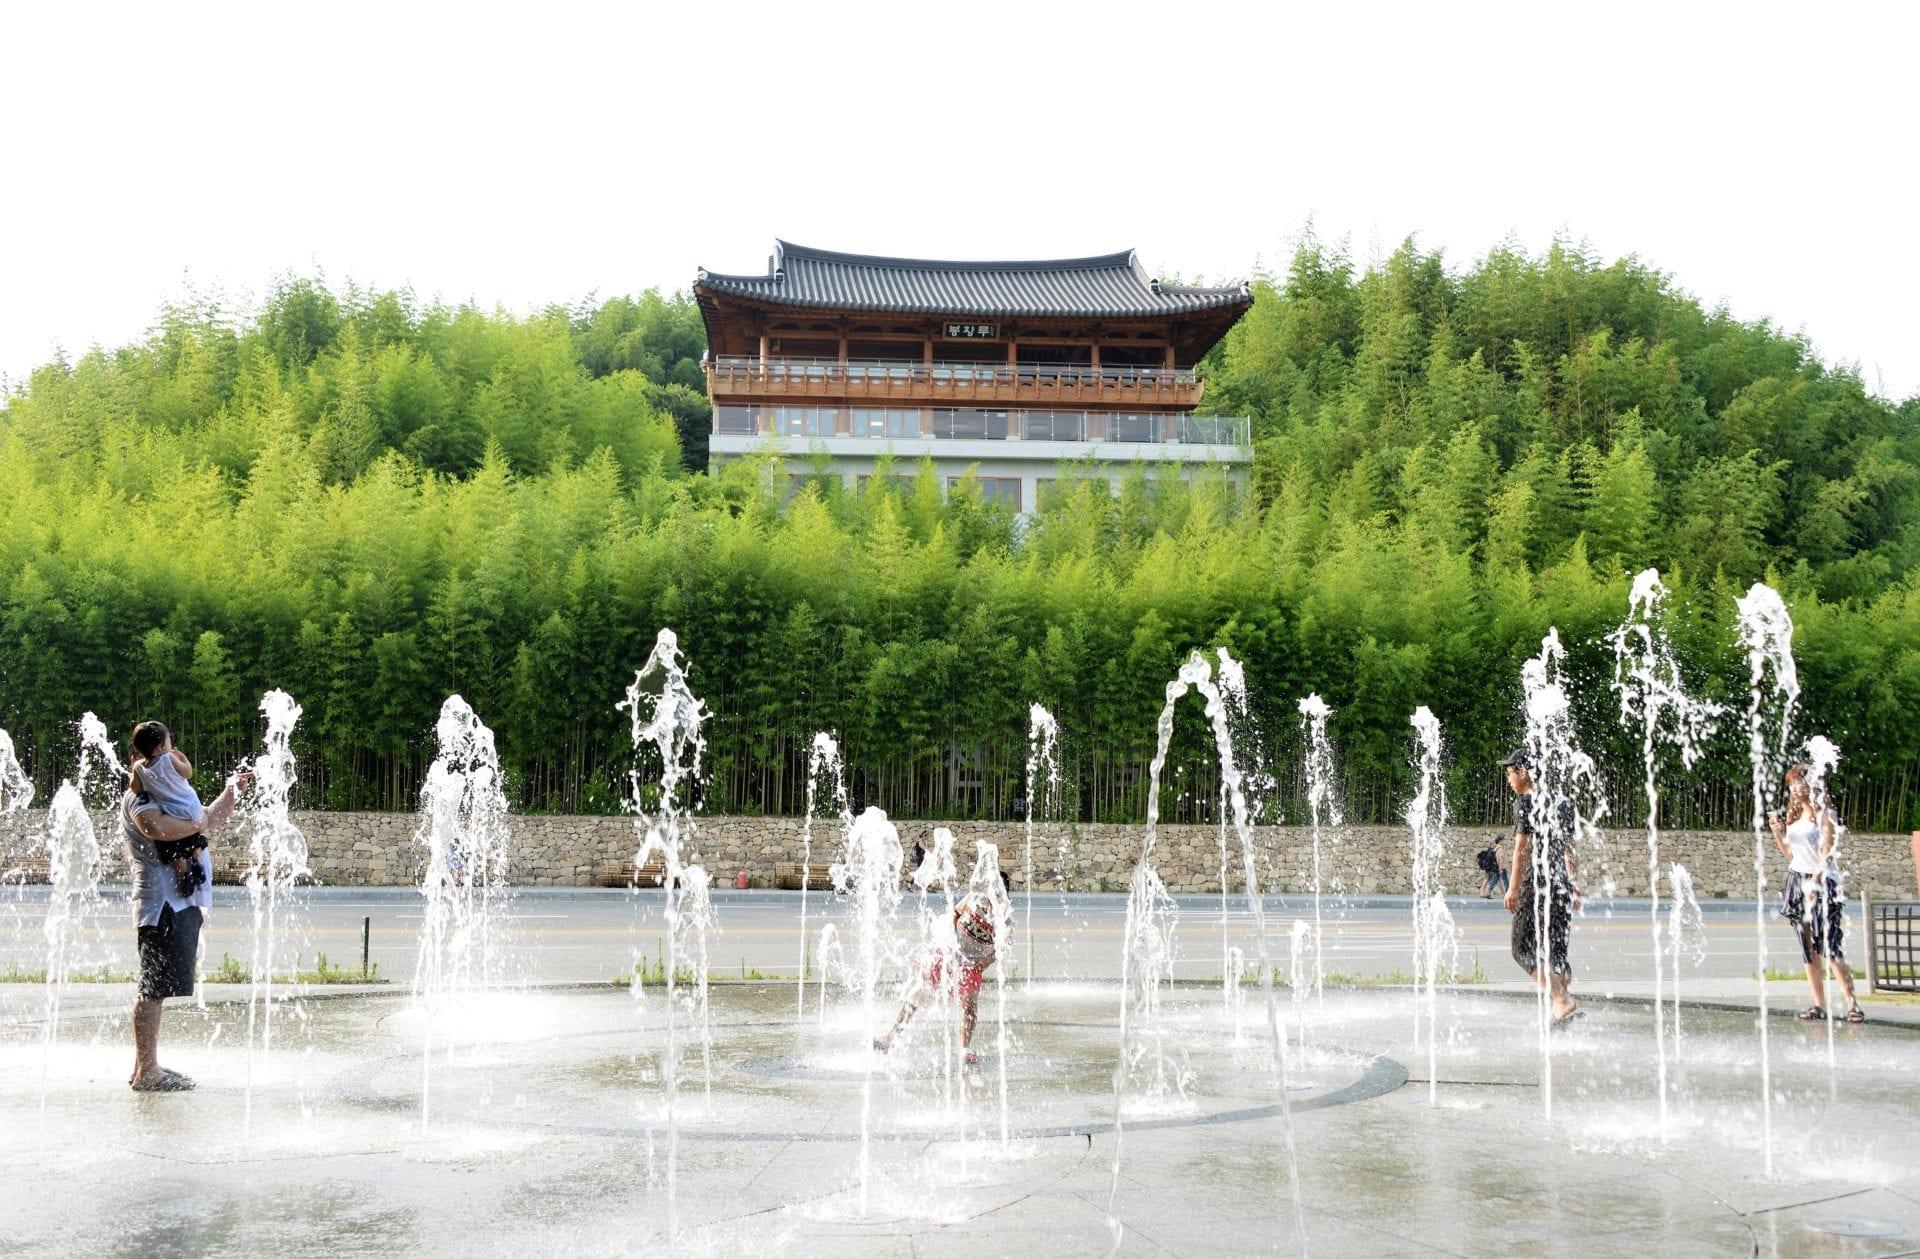 Damyang Bamboo Garden Juknokwon   Damyang-gun